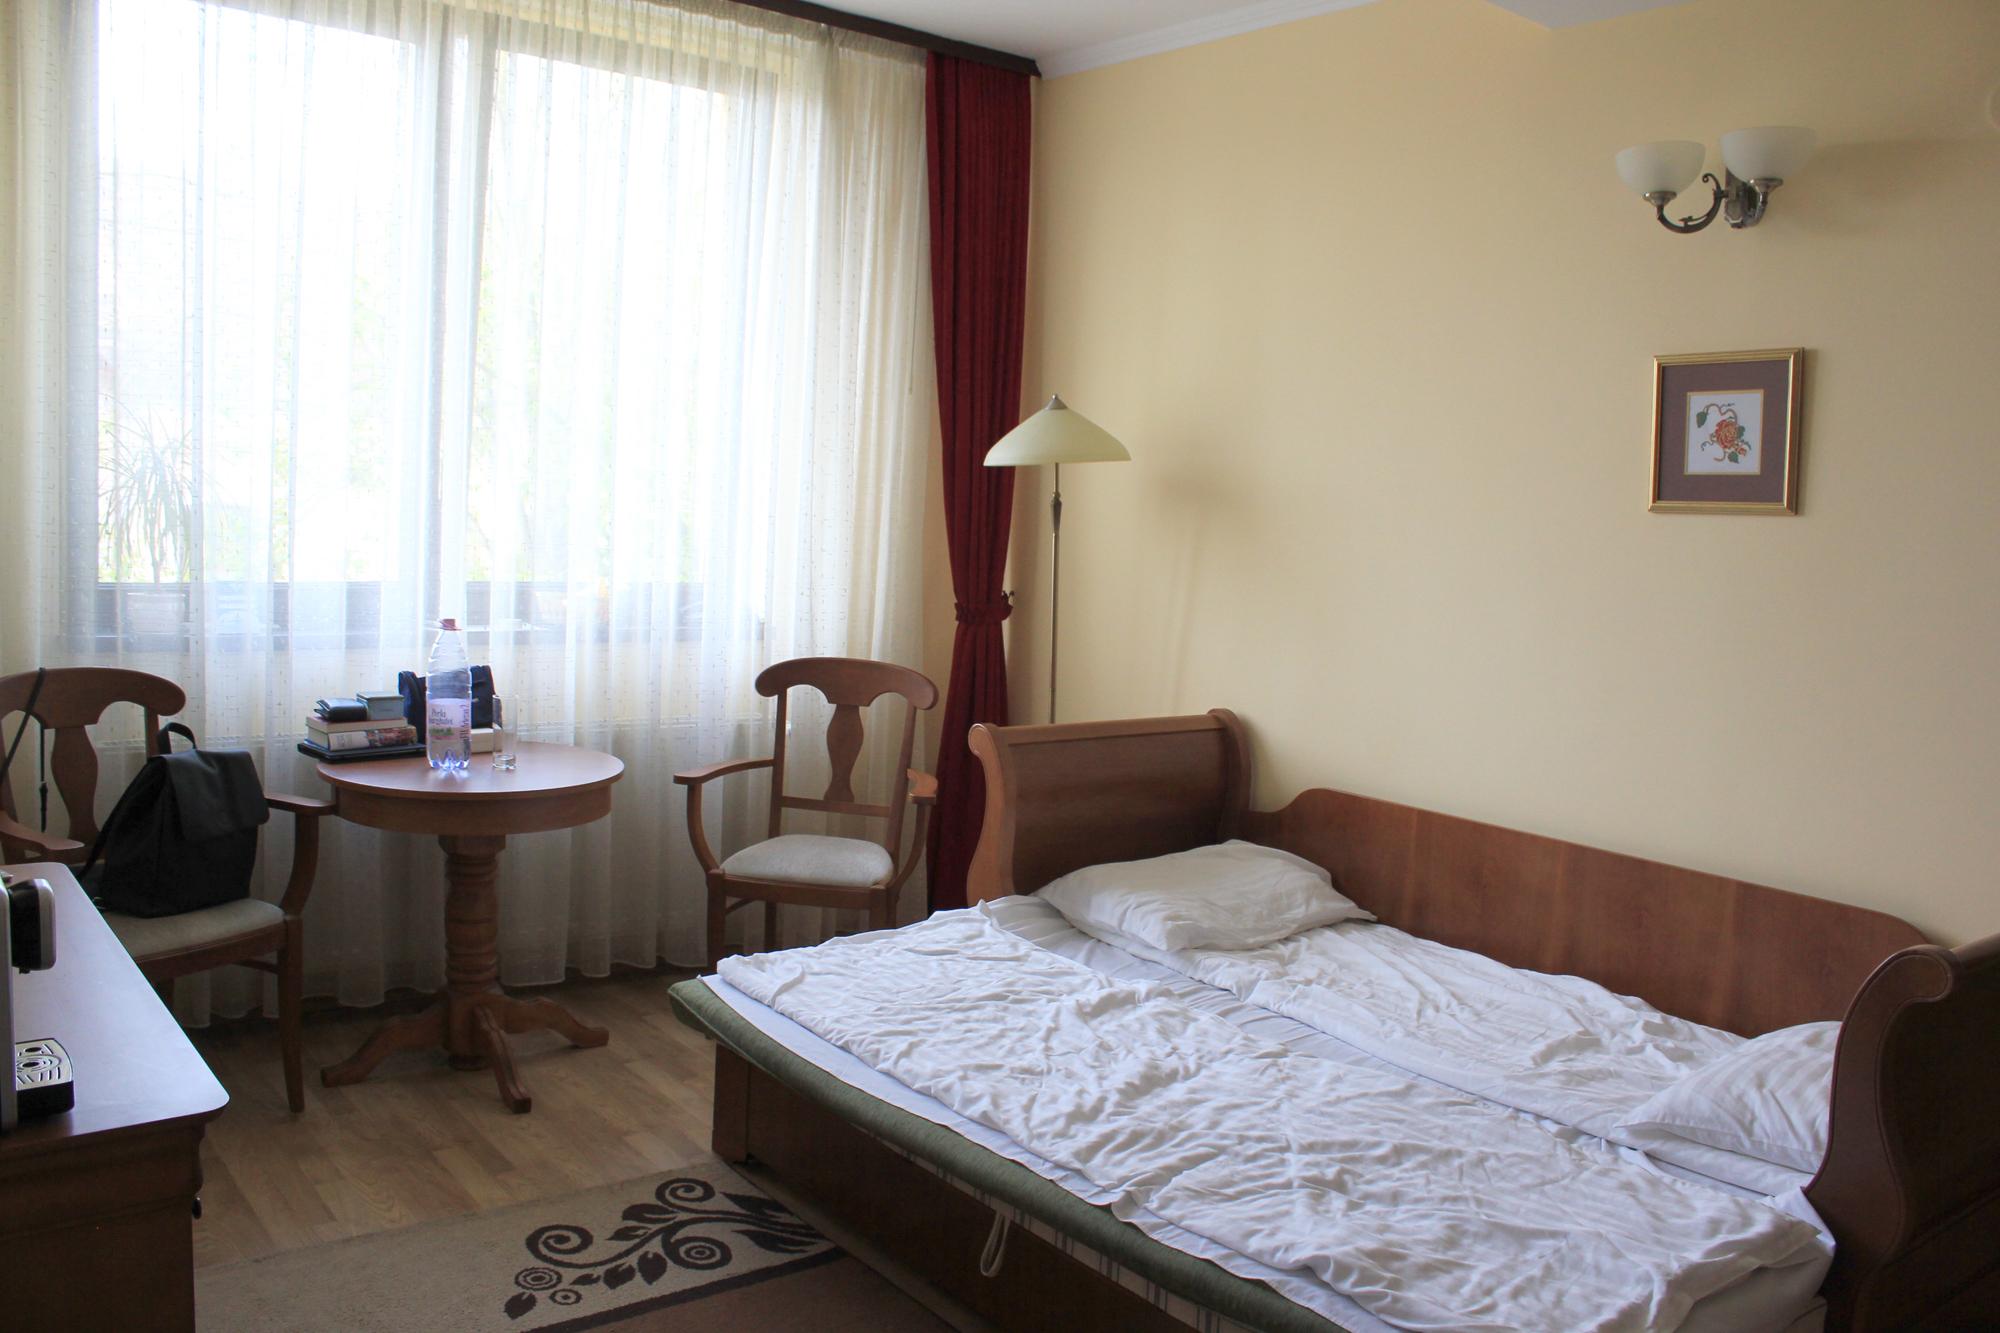 hotel septimia odorheiu secuiesc apartament